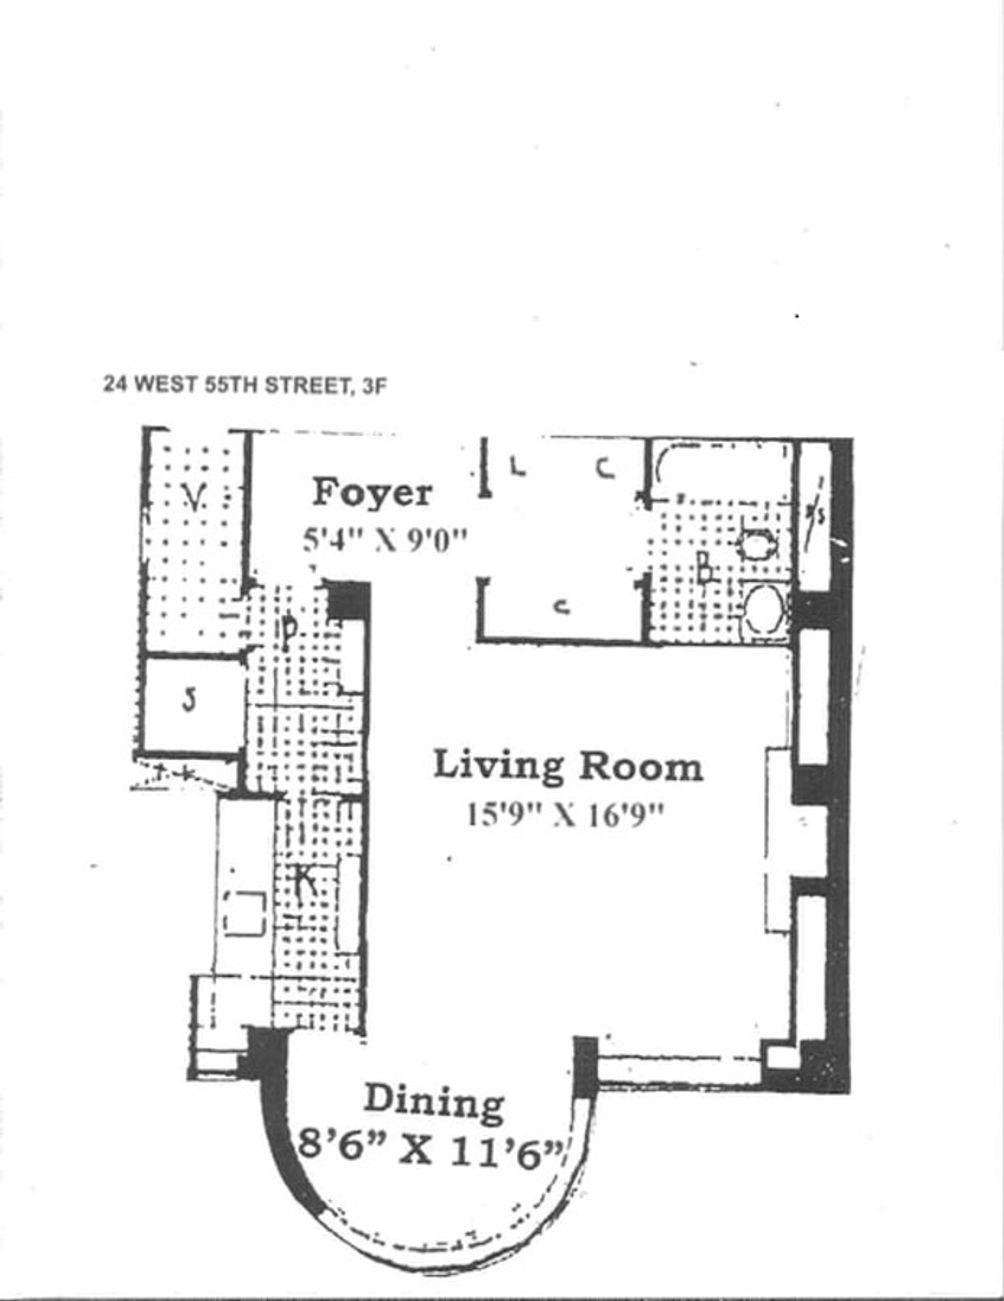 24 West 55th Street #3F floor plan